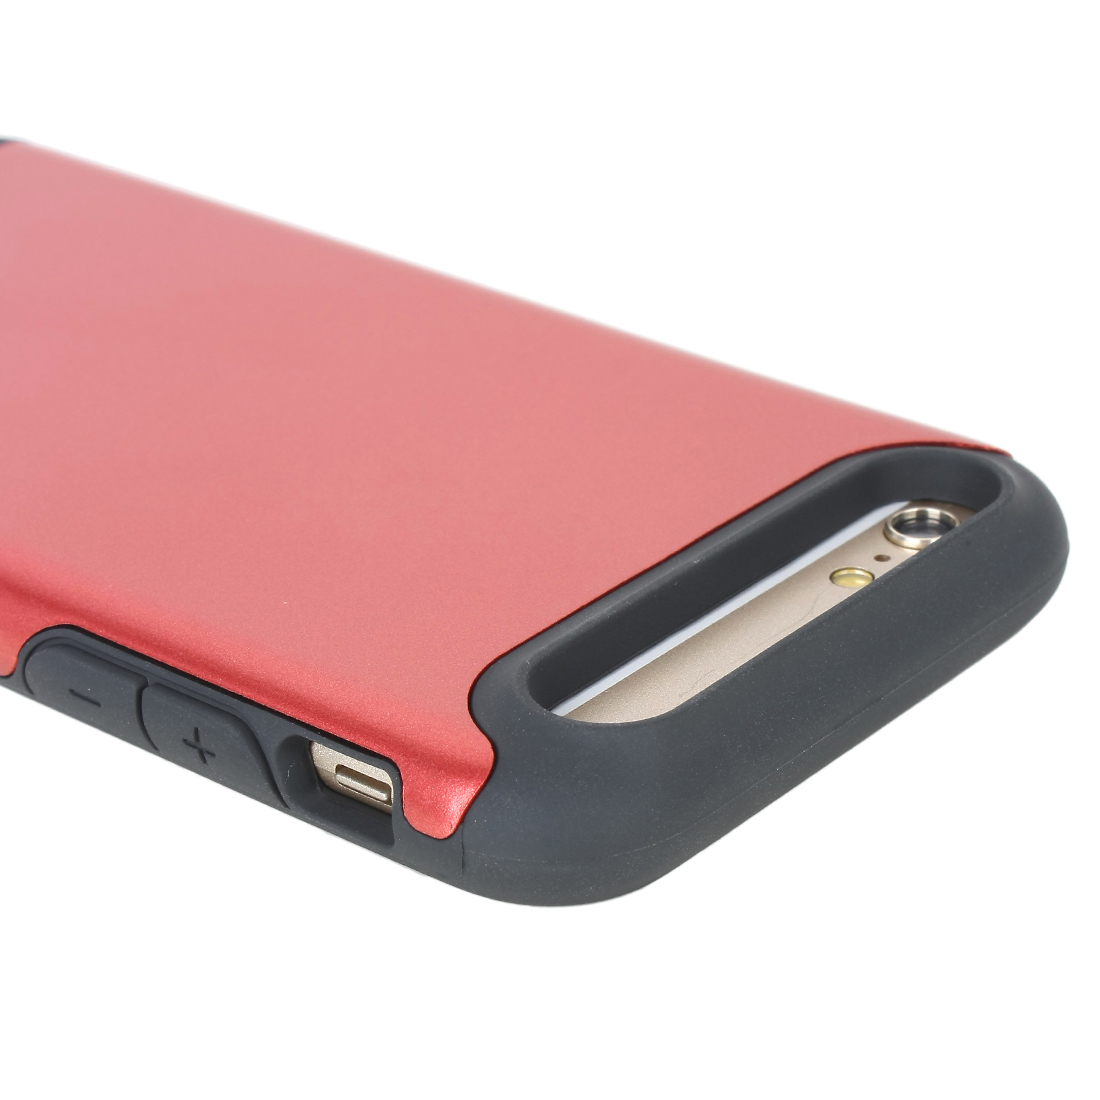 Shockproof Slim Hybrid Hard Rugged Cover Wallet Case for Apple iPhone 6 Red